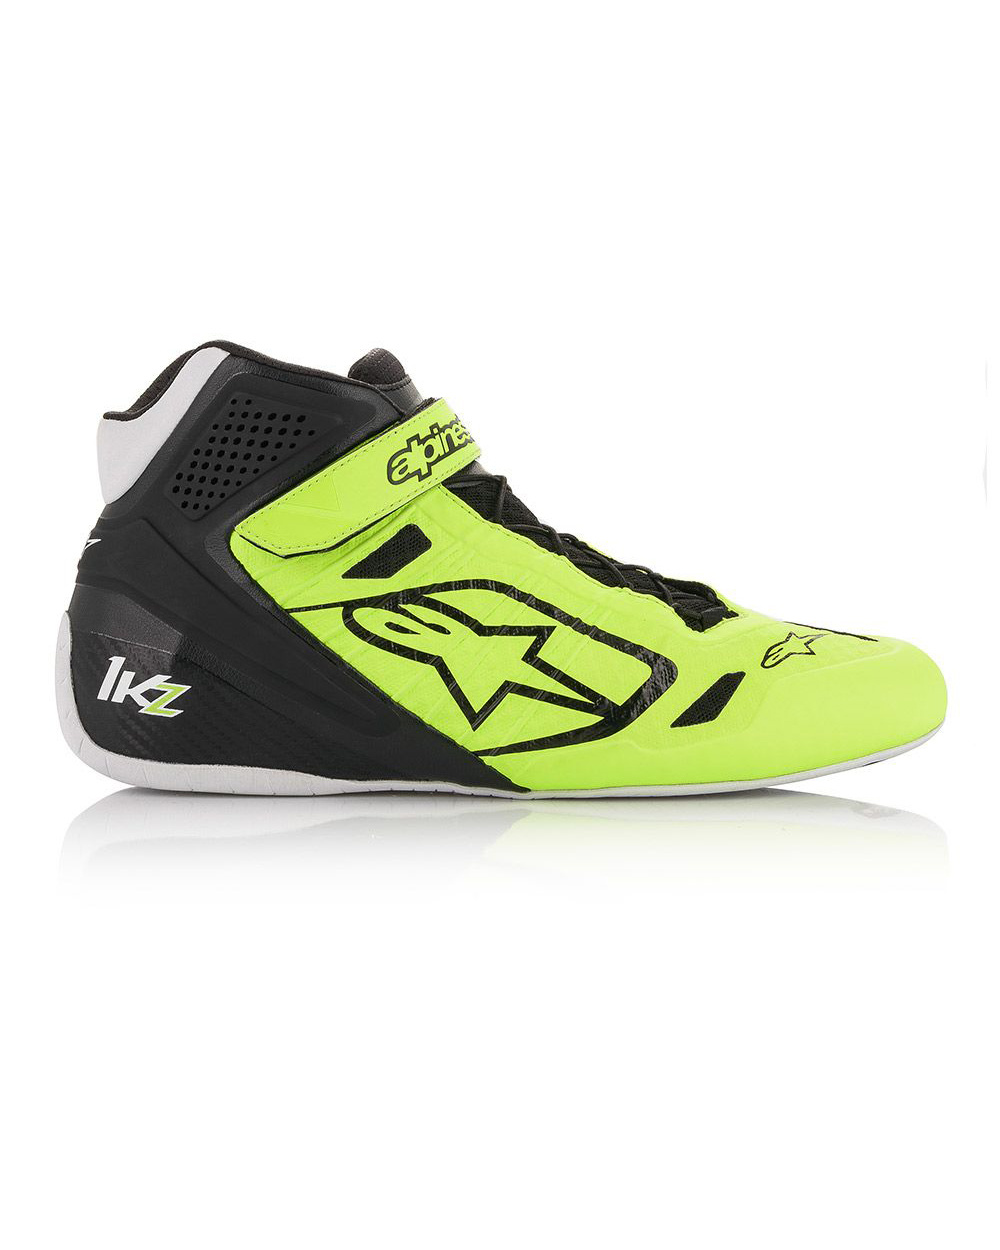 Alpinestars Tech-1 KZ Shoe Yellow Black FLuo